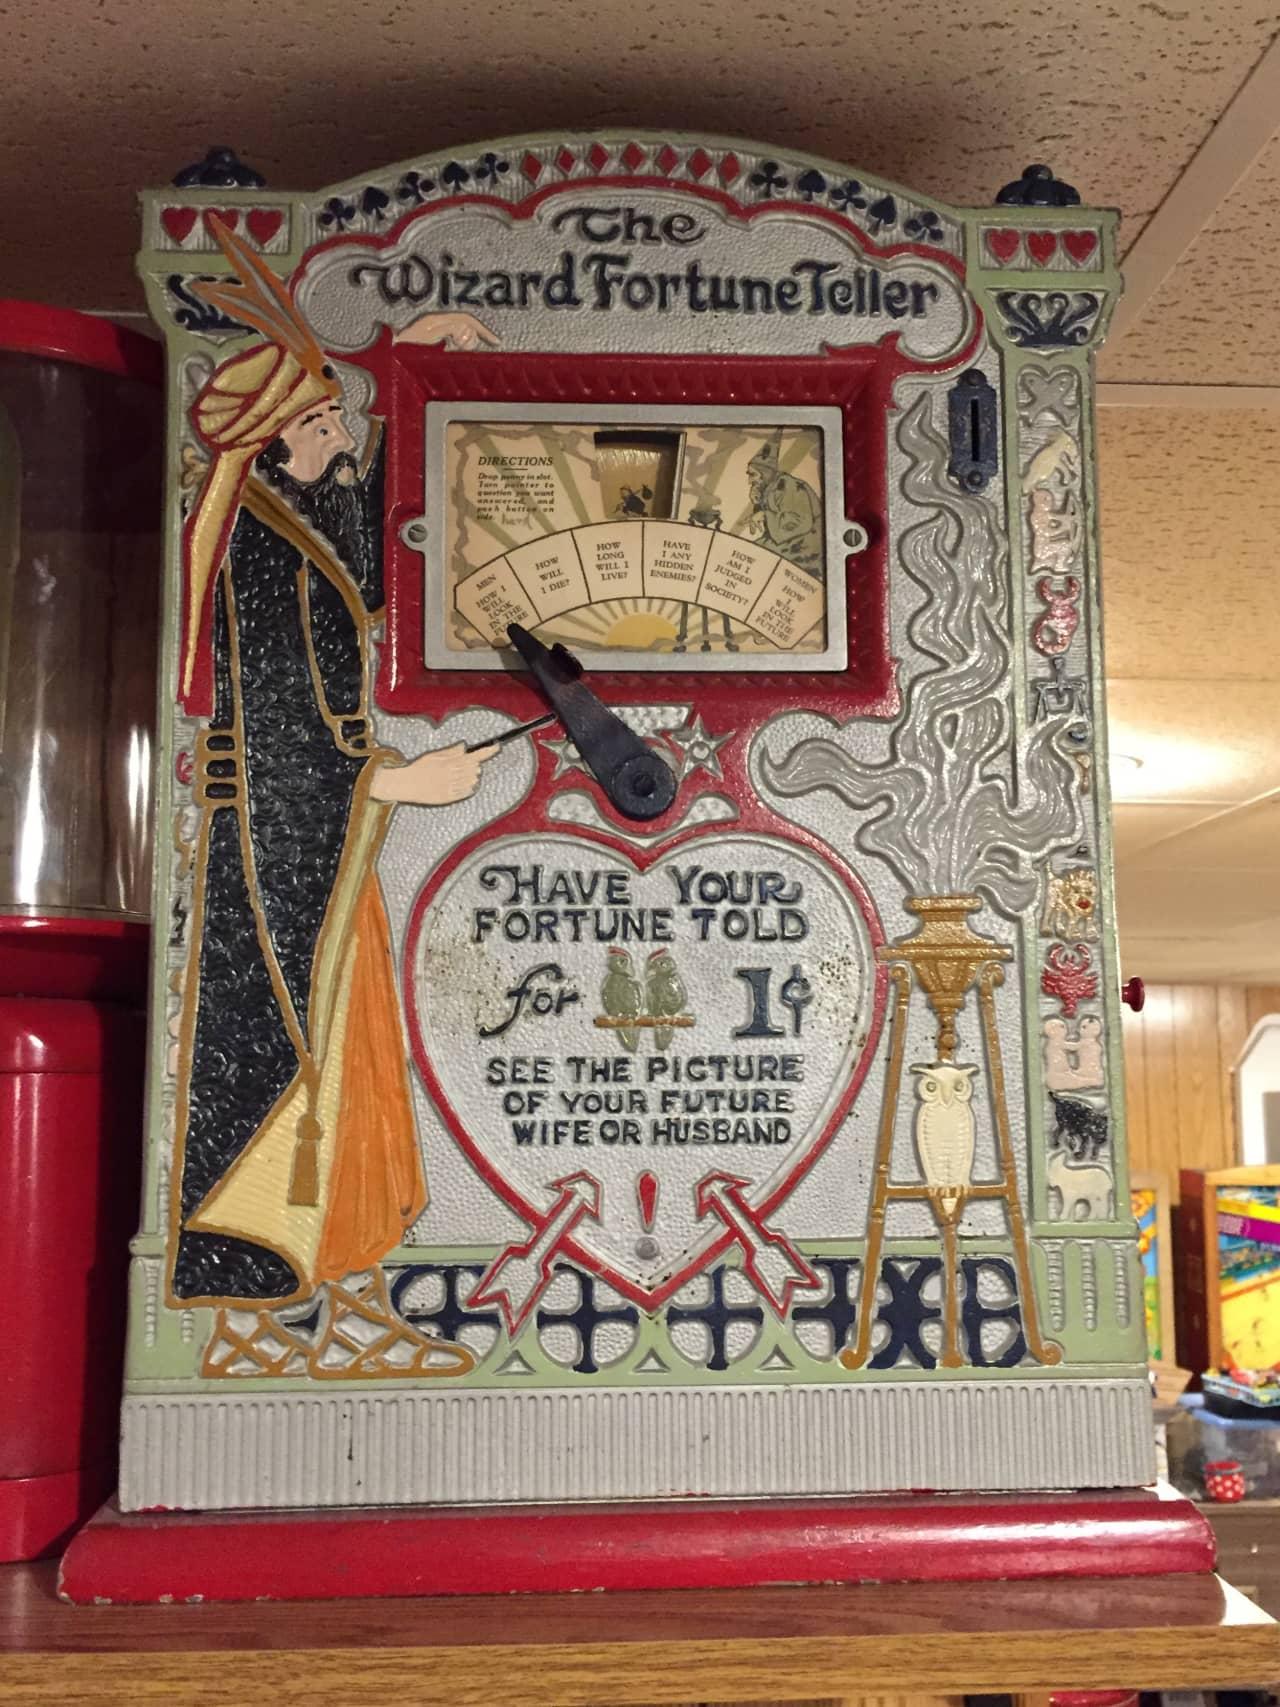 Mills 'The Wizard' Fortune Teller